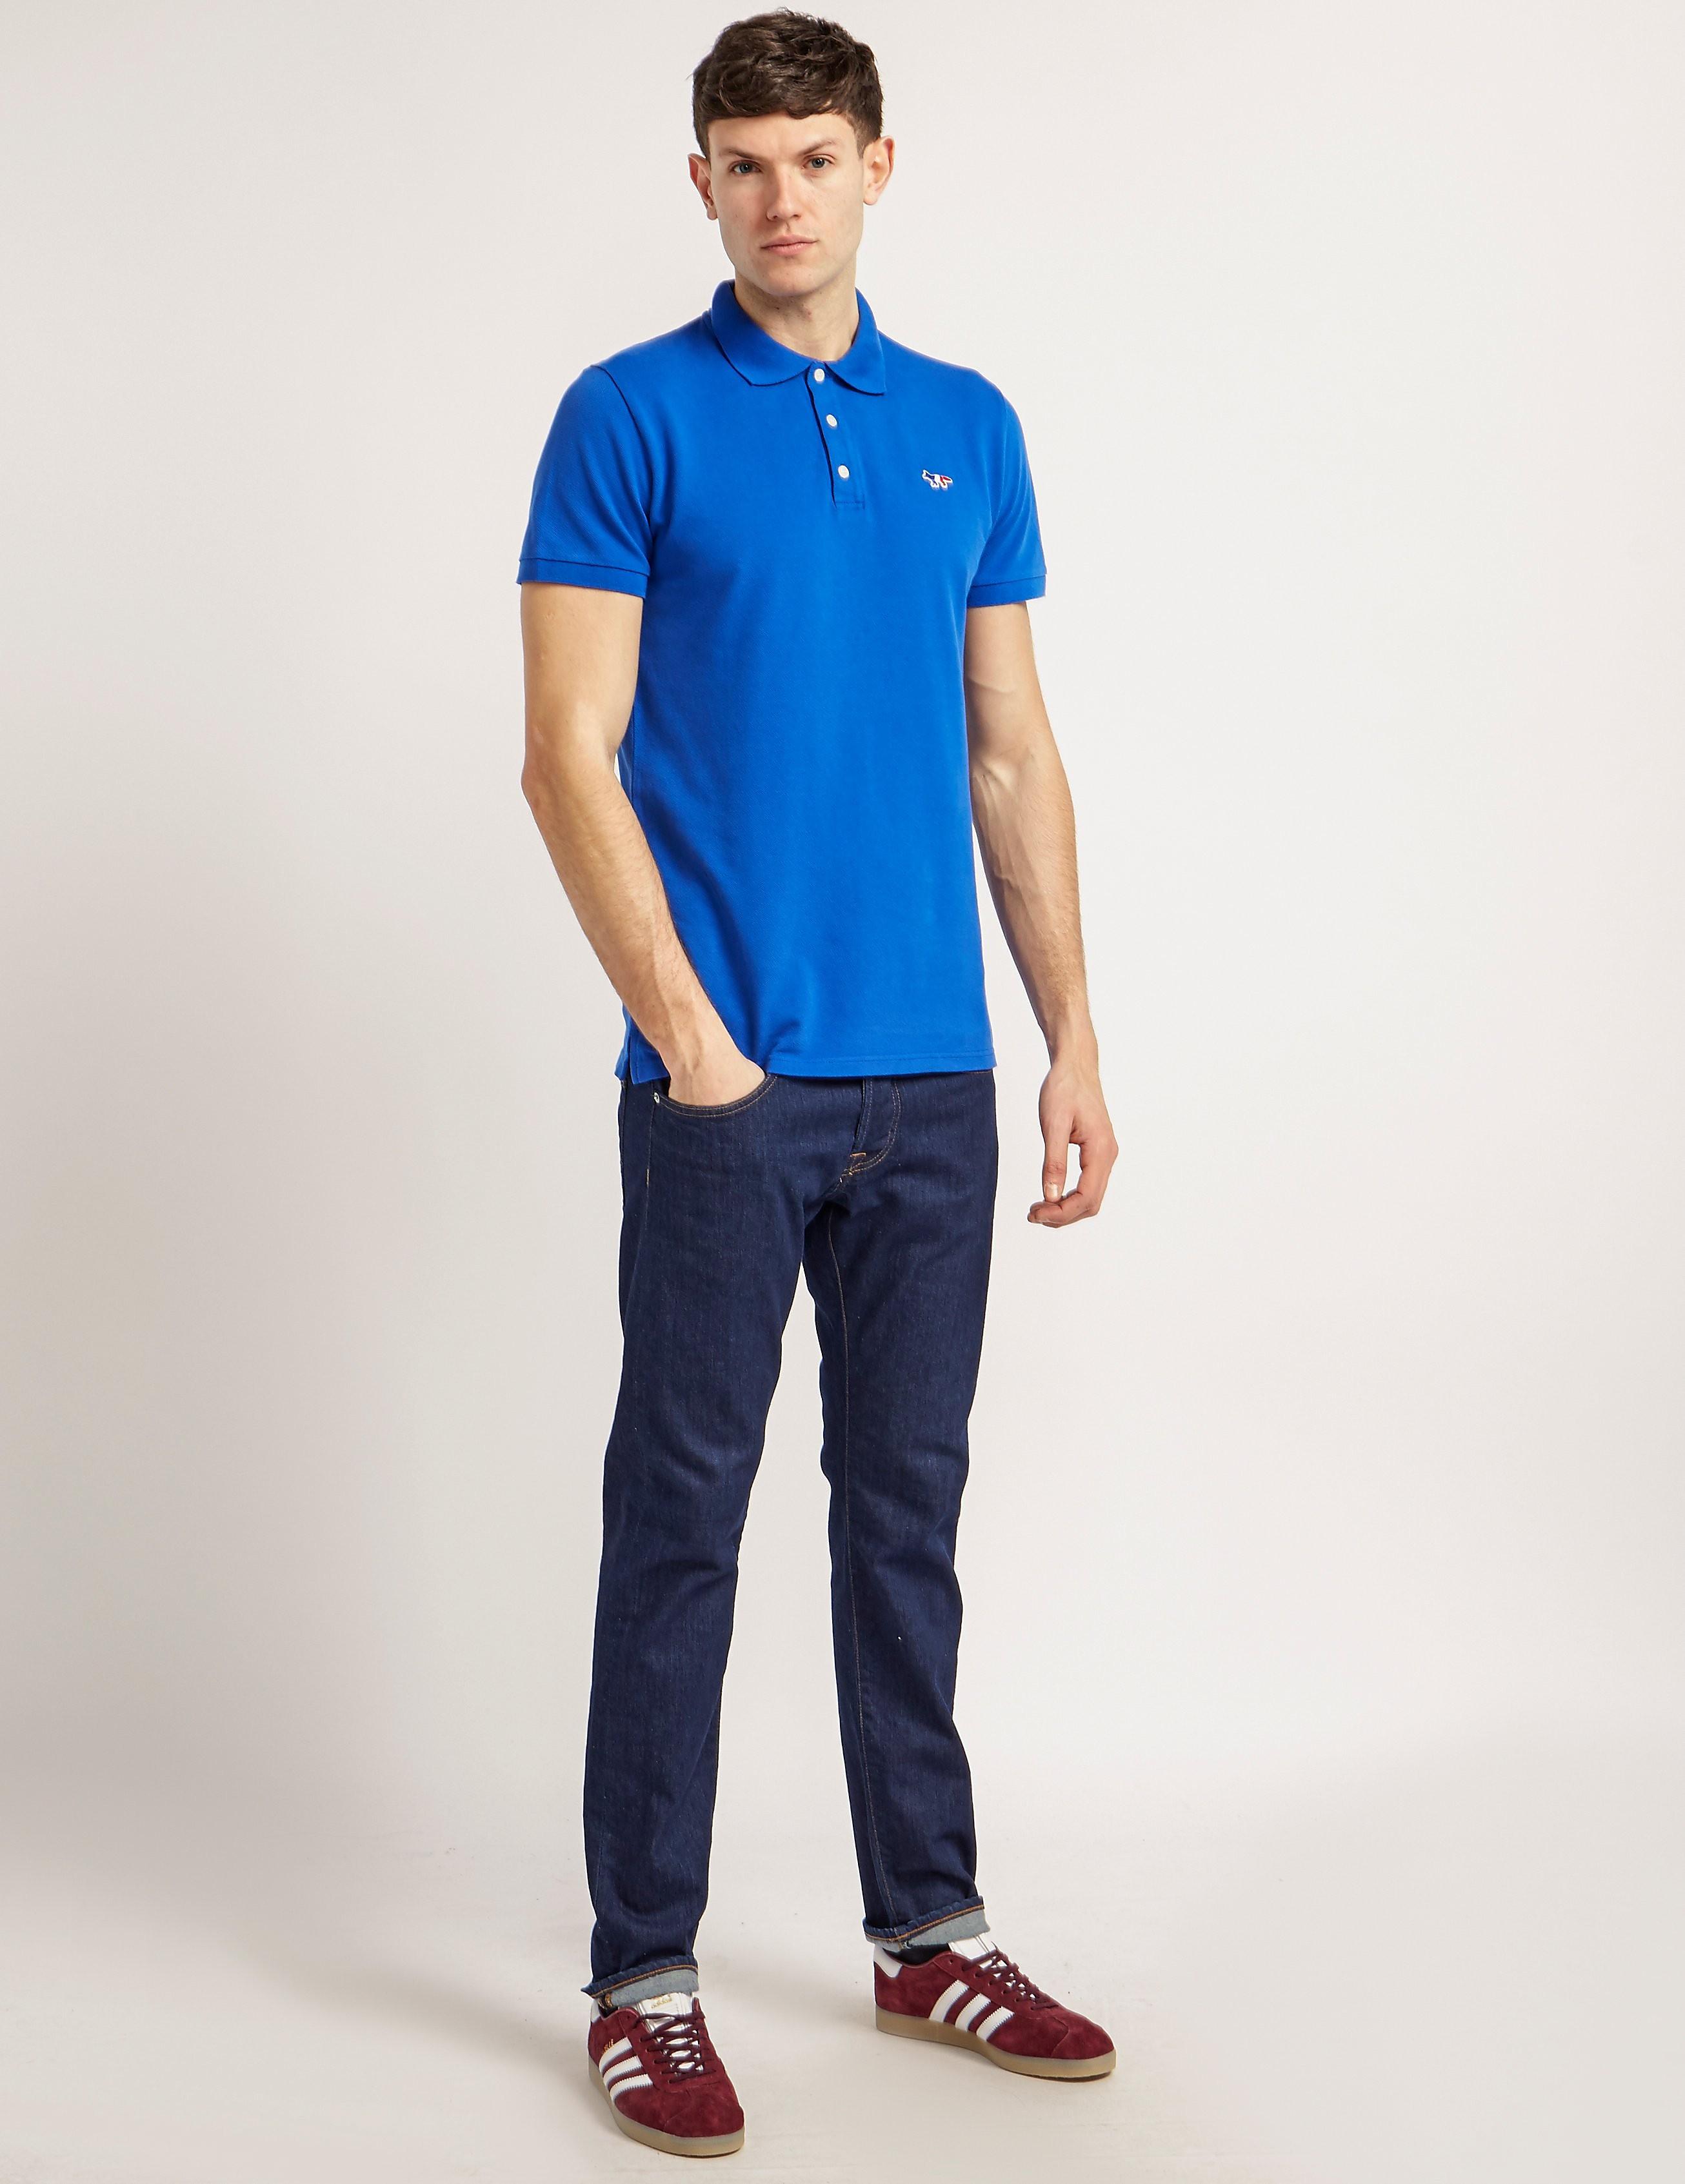 Maison Kitsune Trifox Polo Shirt